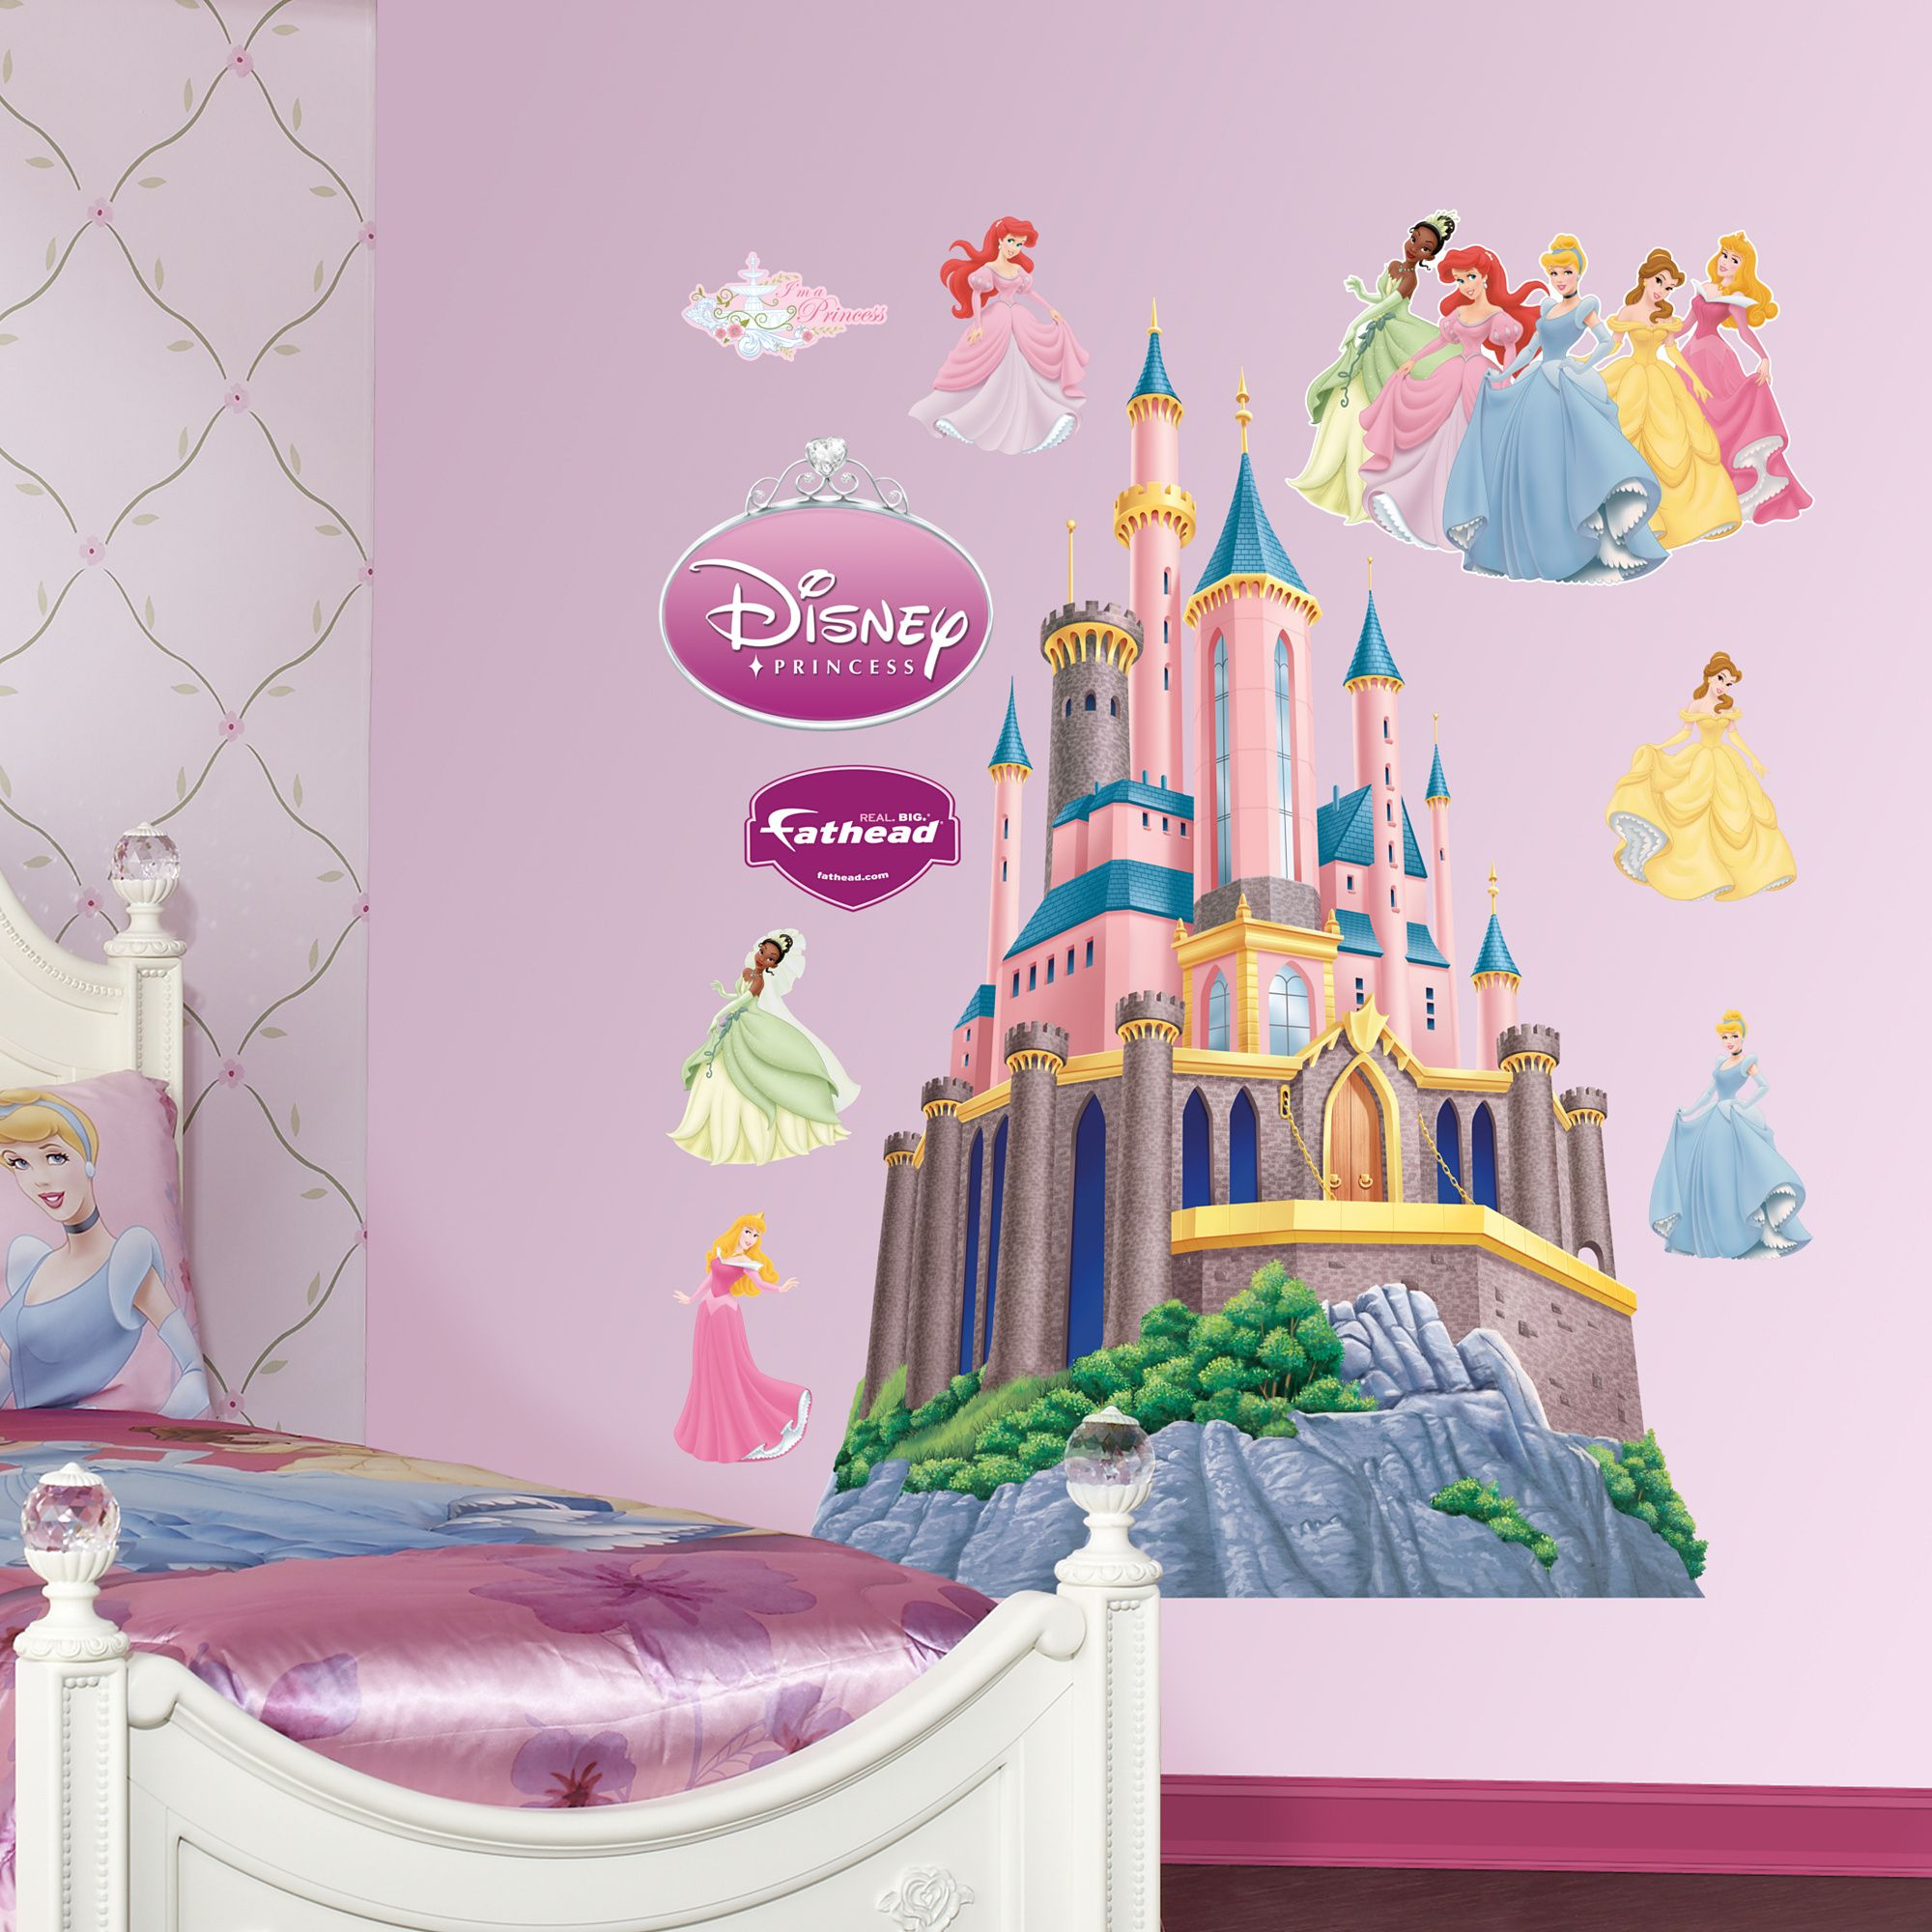 Princess Wall Mural Decals